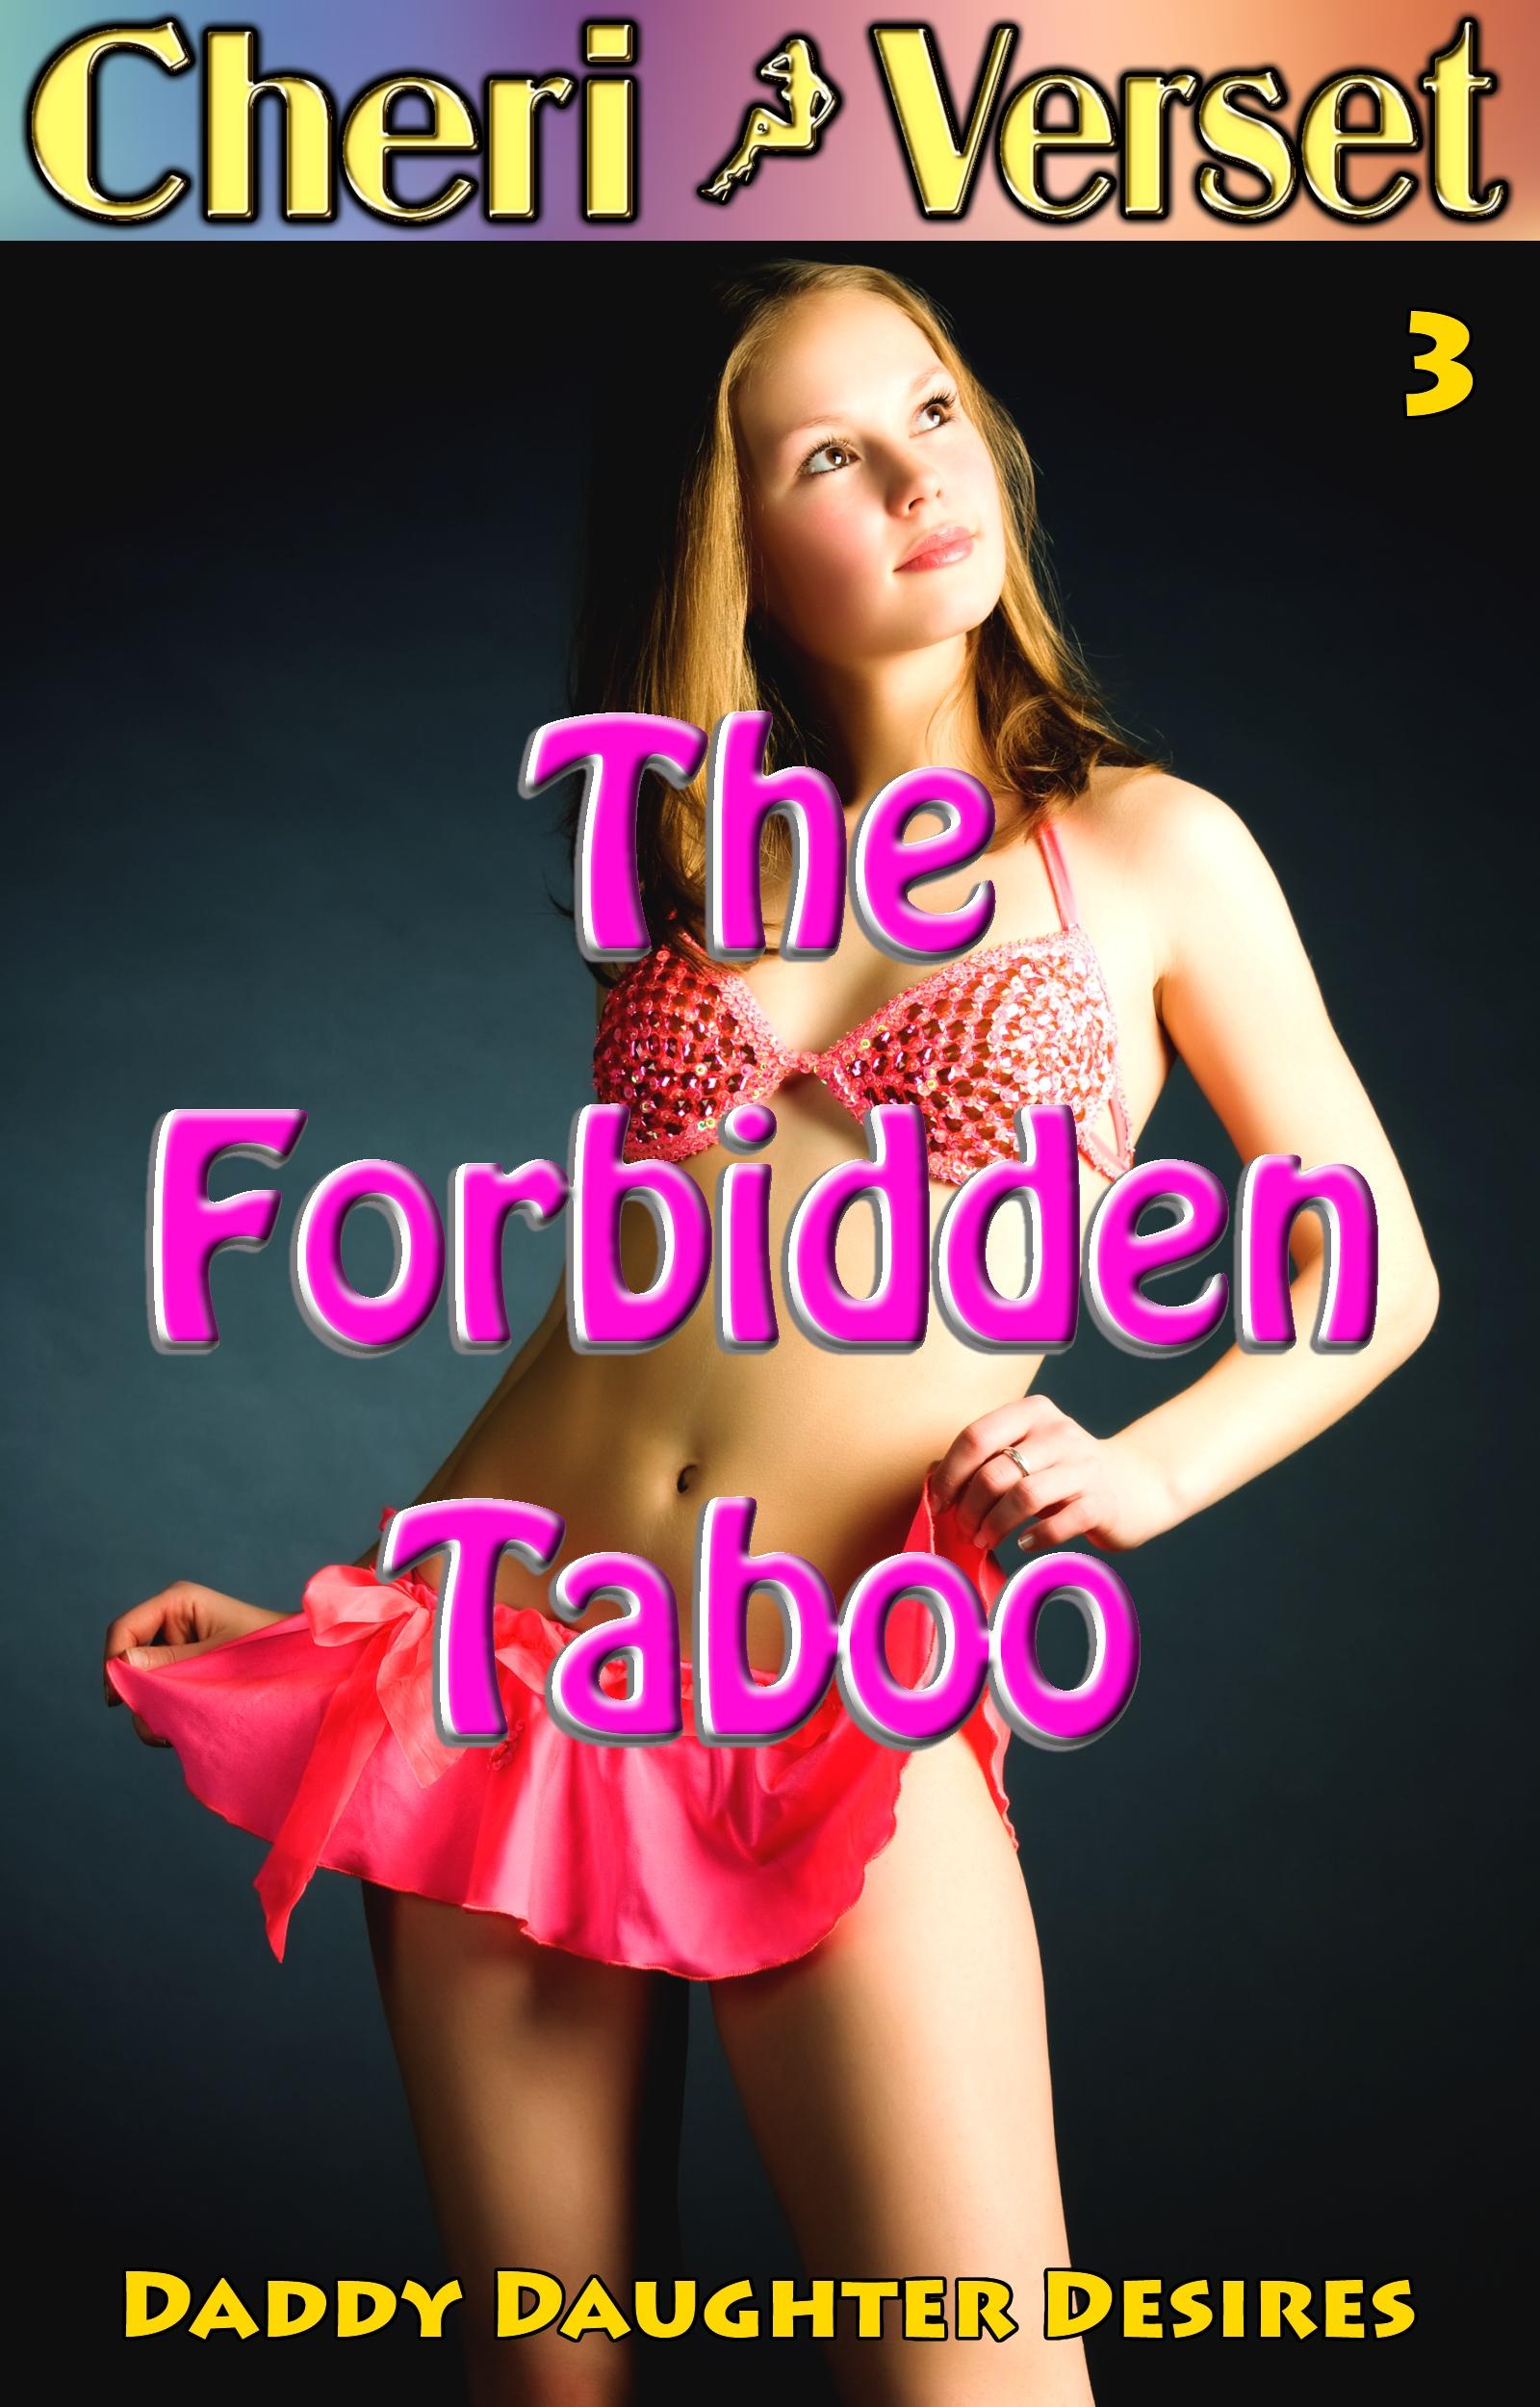 Cheri Verset - The Forbidden Taboo 3 - Daddy Daughter Desires (father sex erotica)